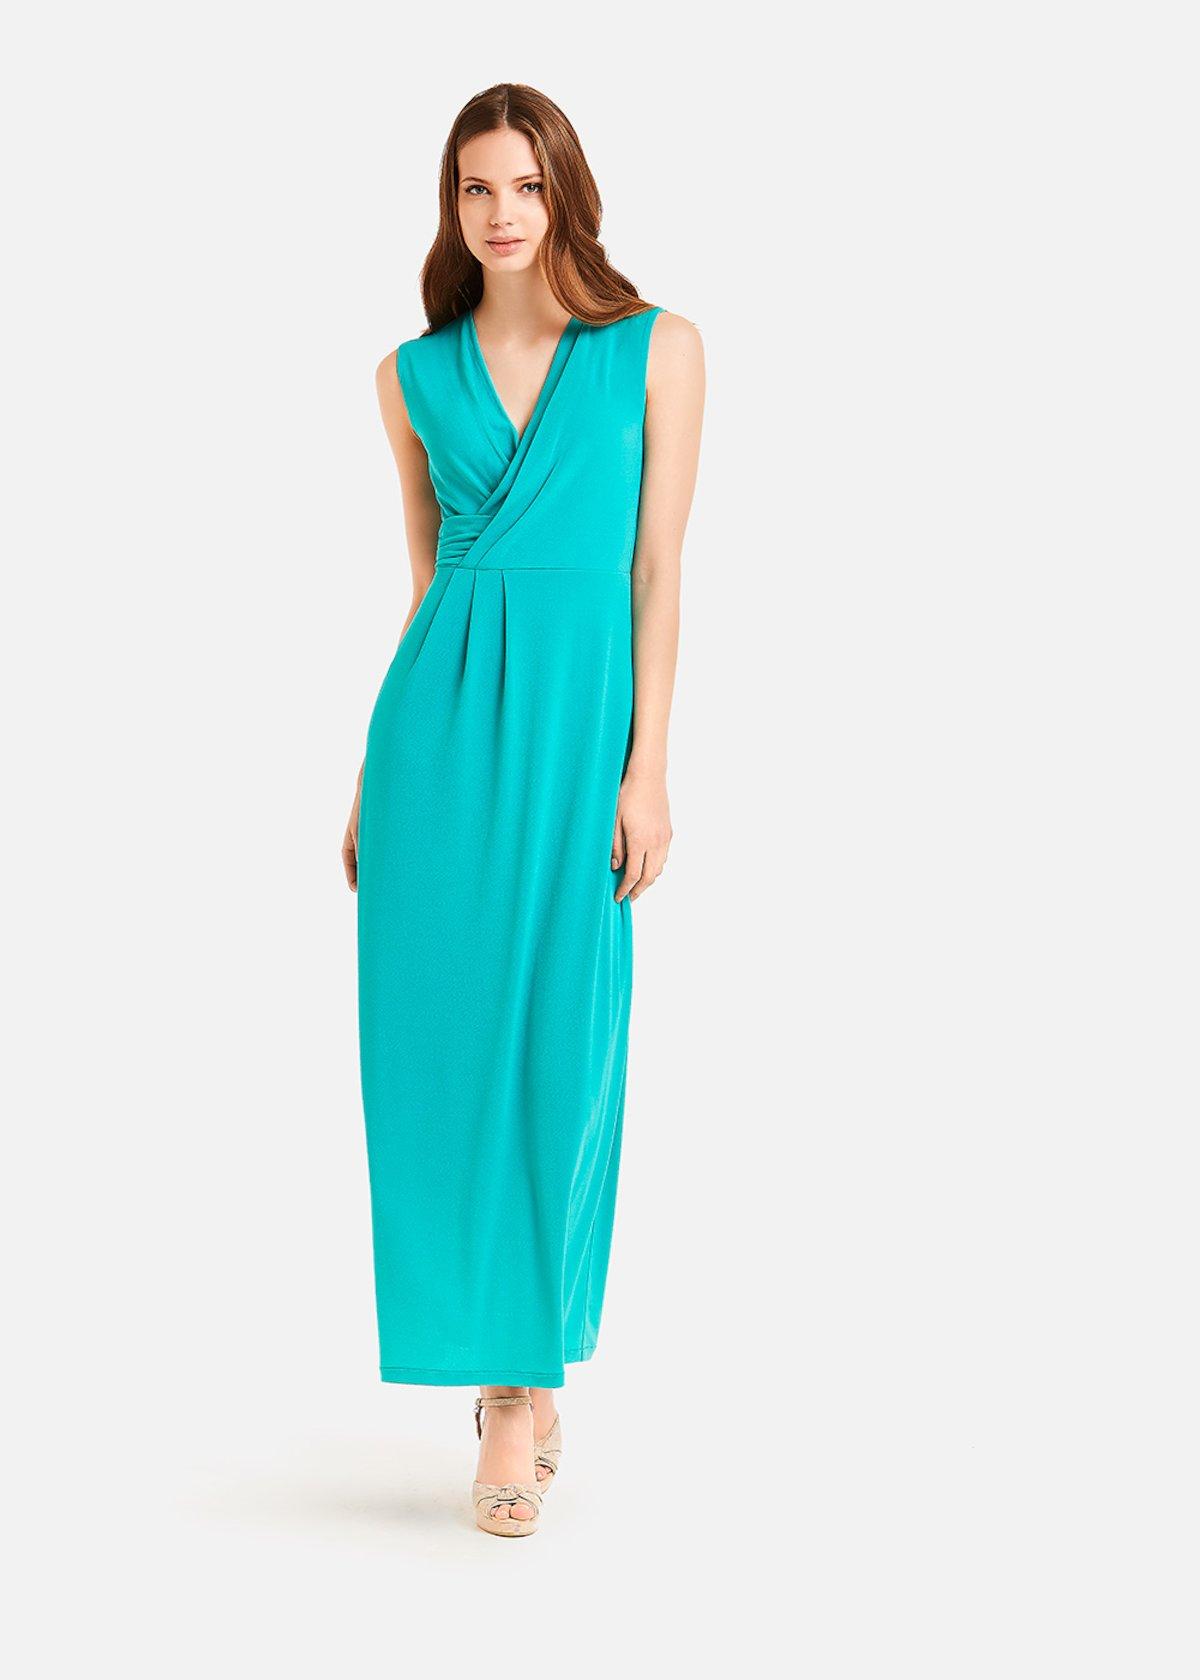 Adrien long dress with drape detail - Emerald